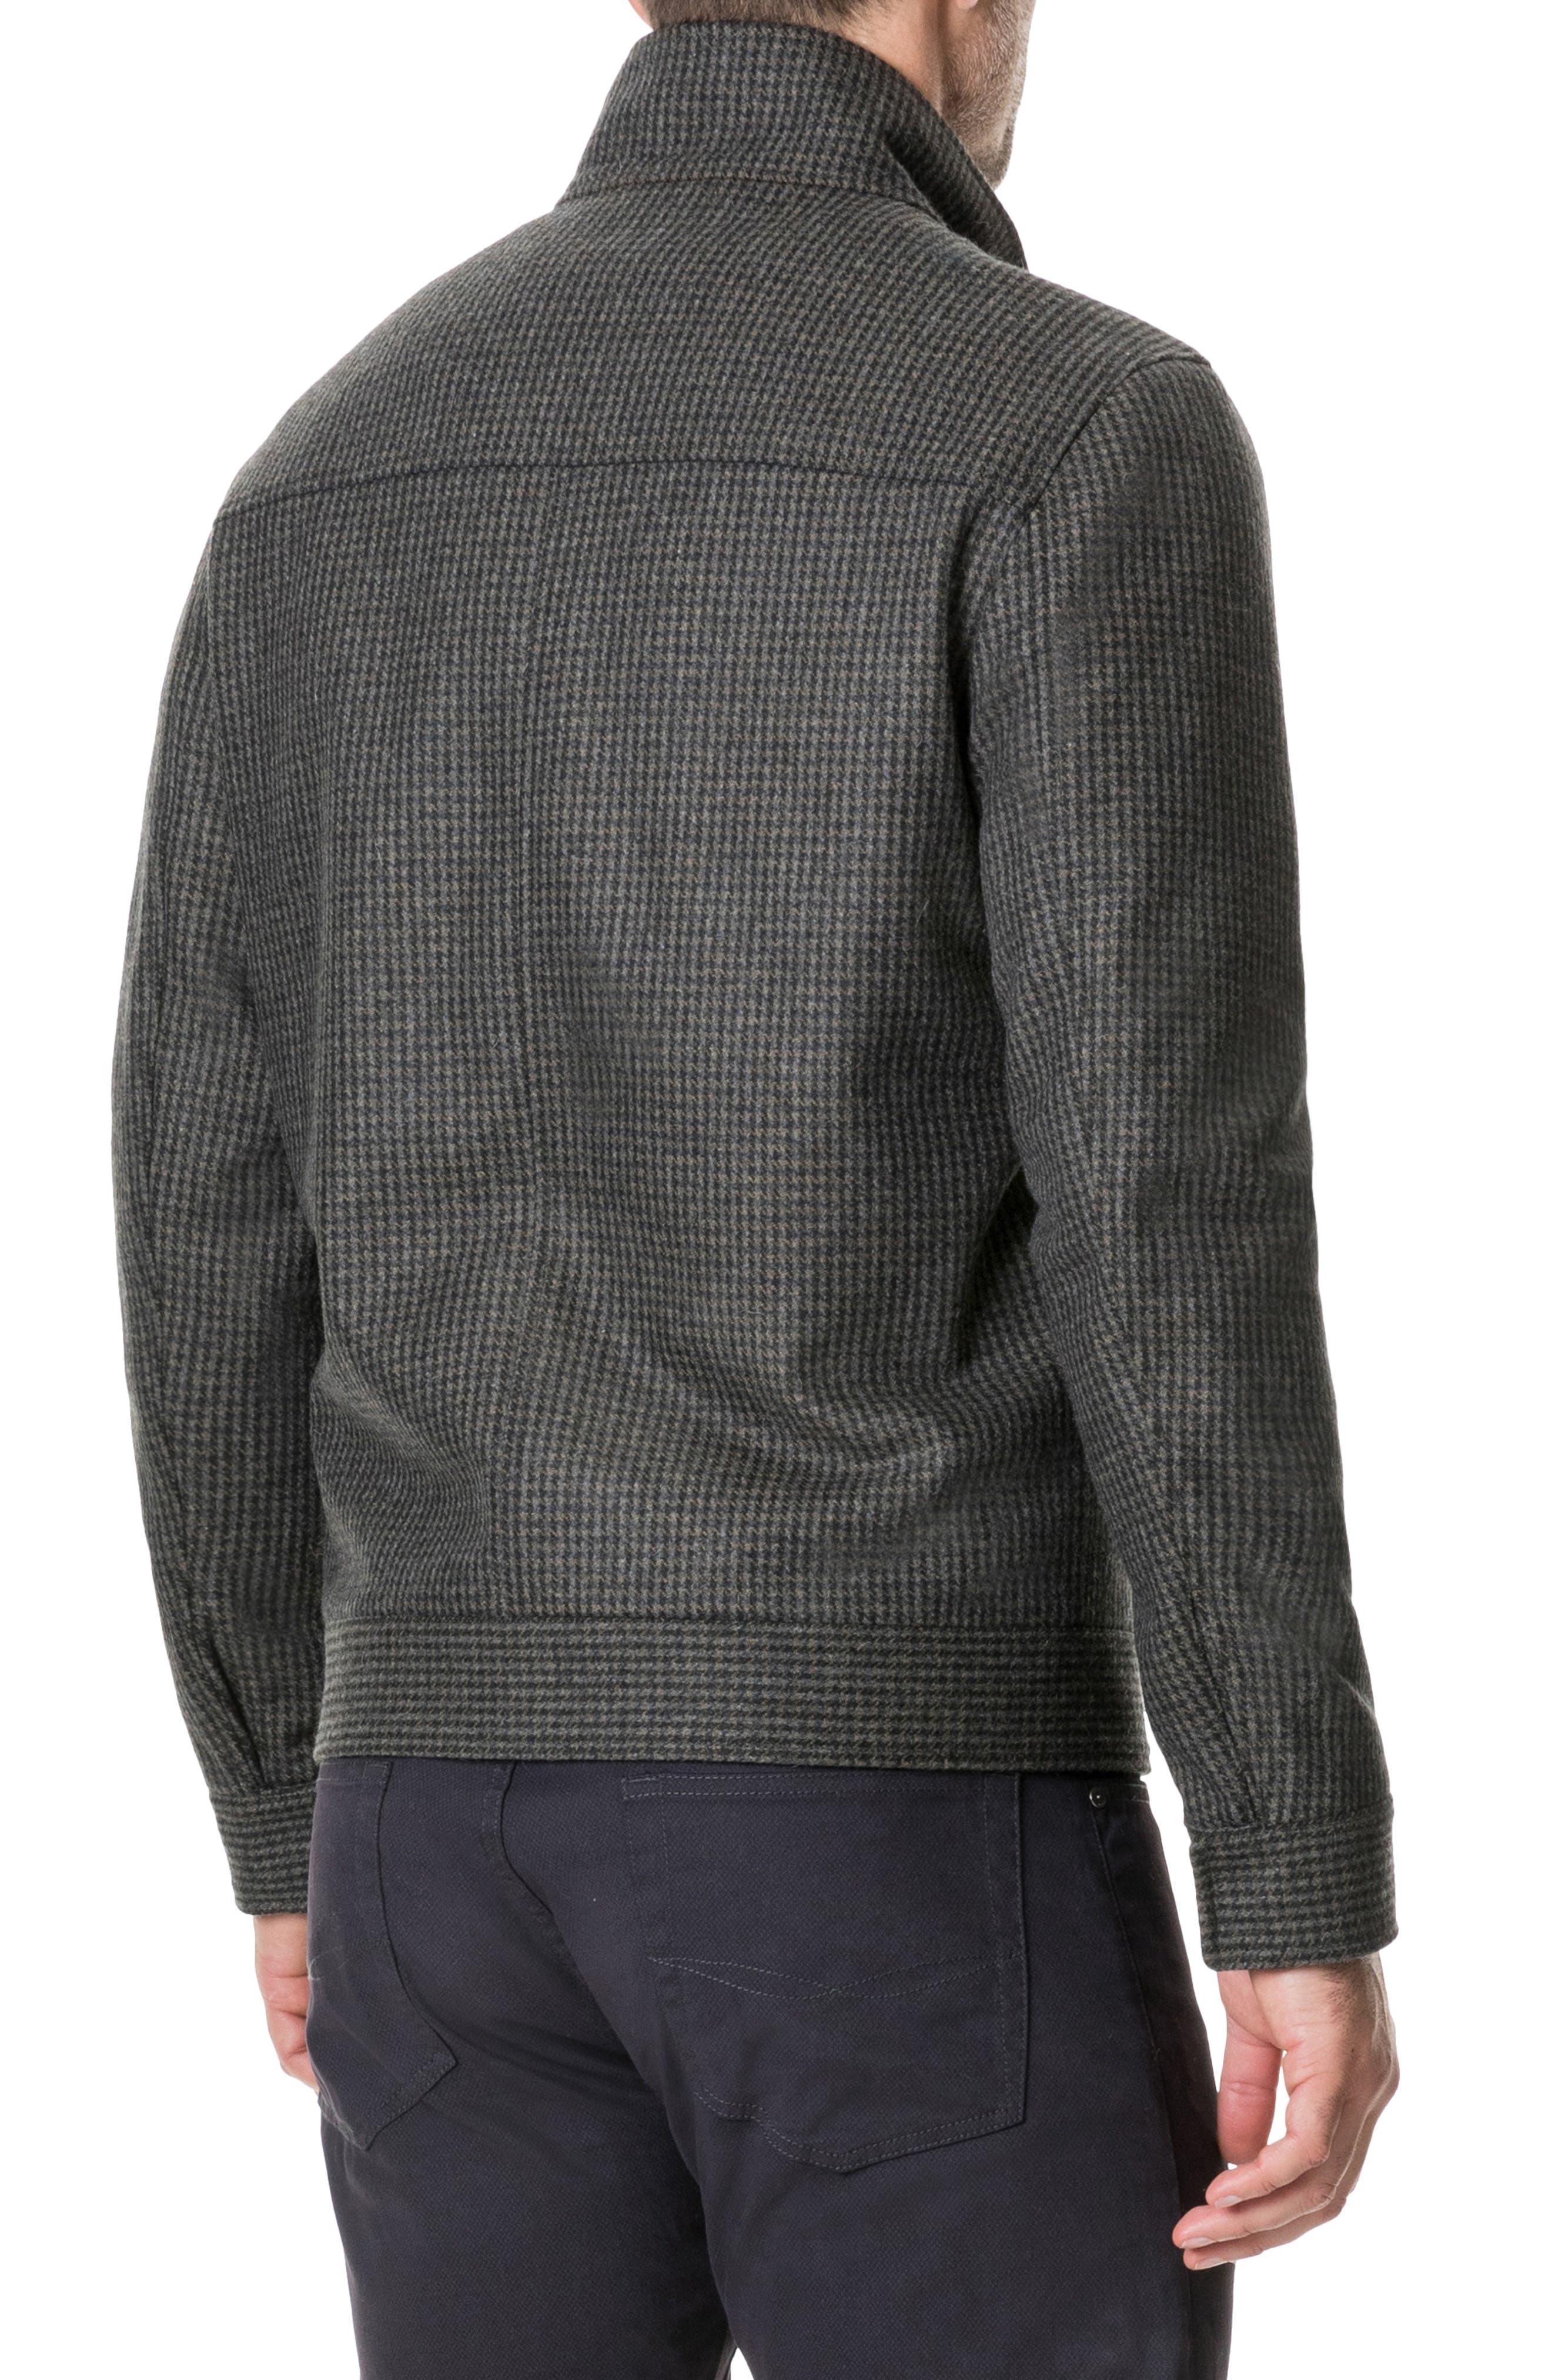 Oyster Cove Regular Fit Wool Blend Jacket,                             Alternate thumbnail 2, color,                             OLIVE